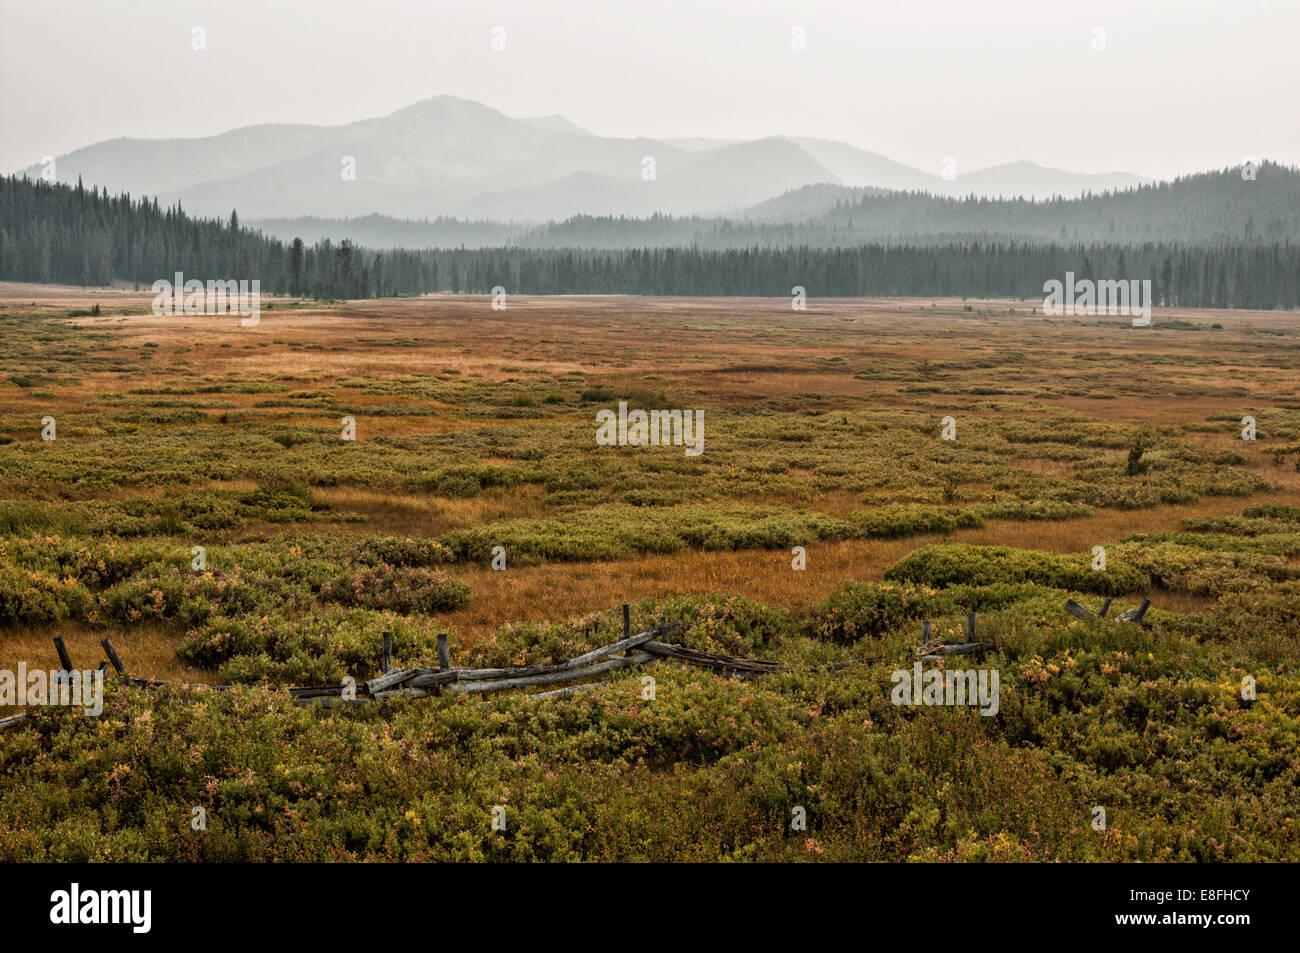 USA, Idaho, Custer County, Stanley, Smokey Mountains in foggy day - Stock Image